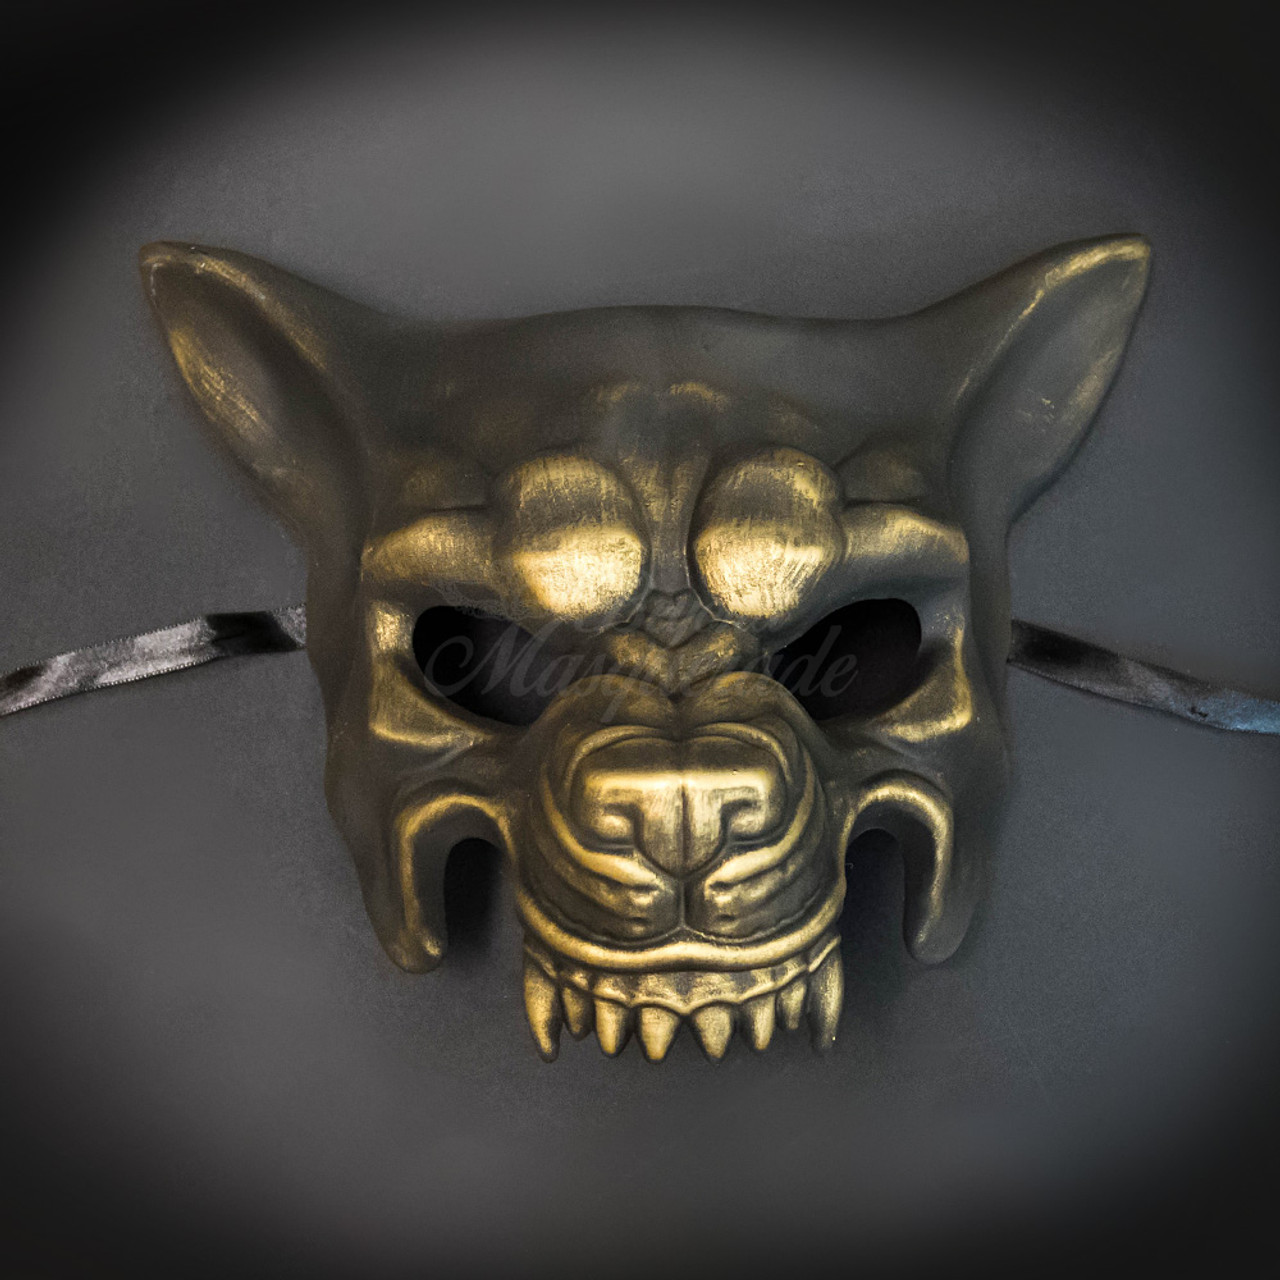 wolverine masquerade mask